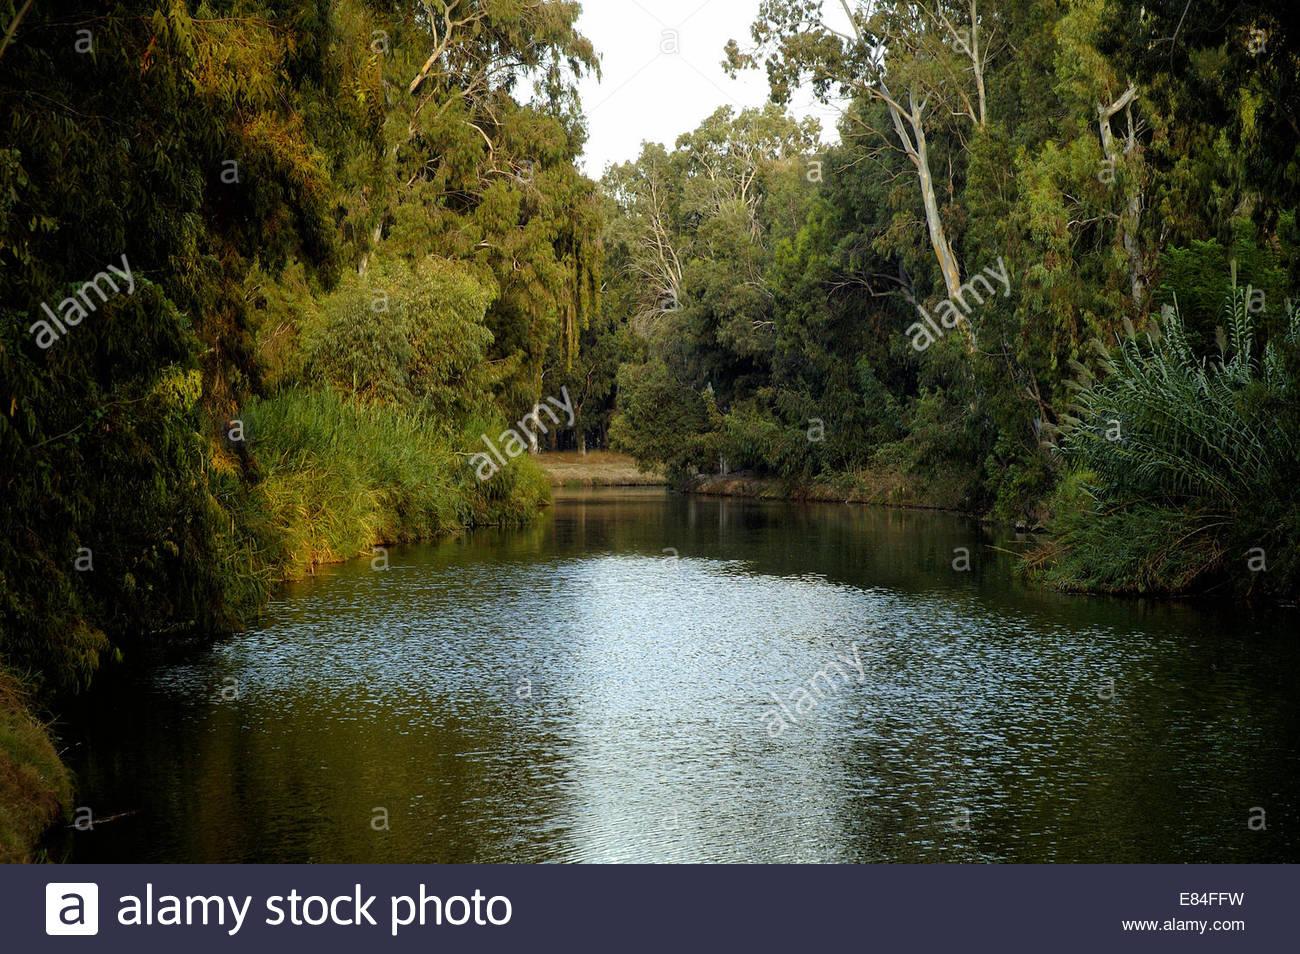 View of the Yarkon or Yarqon river which flows west through Gush Dan conurbation and Tel Aviv's Yarkon Park - Stock Image